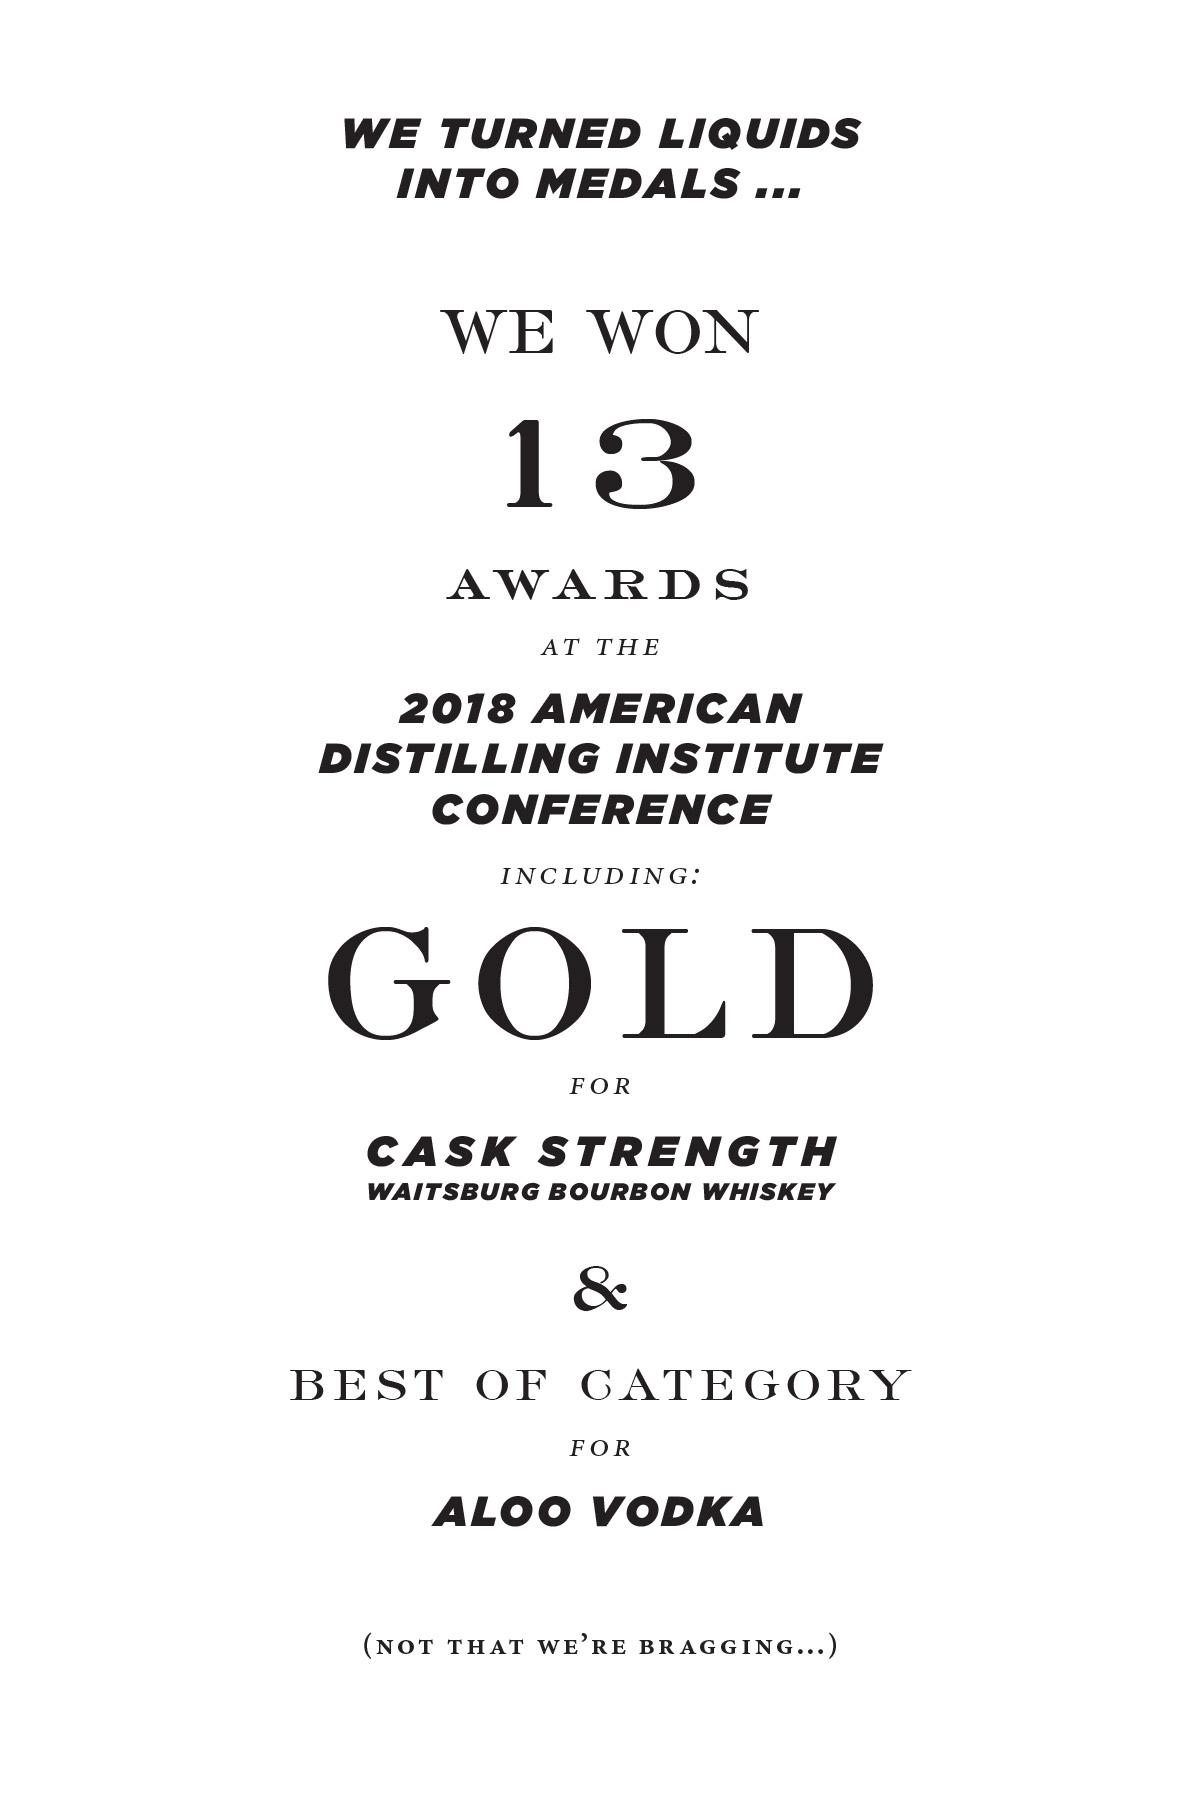 adi_awards_annoucement2018_adi 2018 awards.jpg